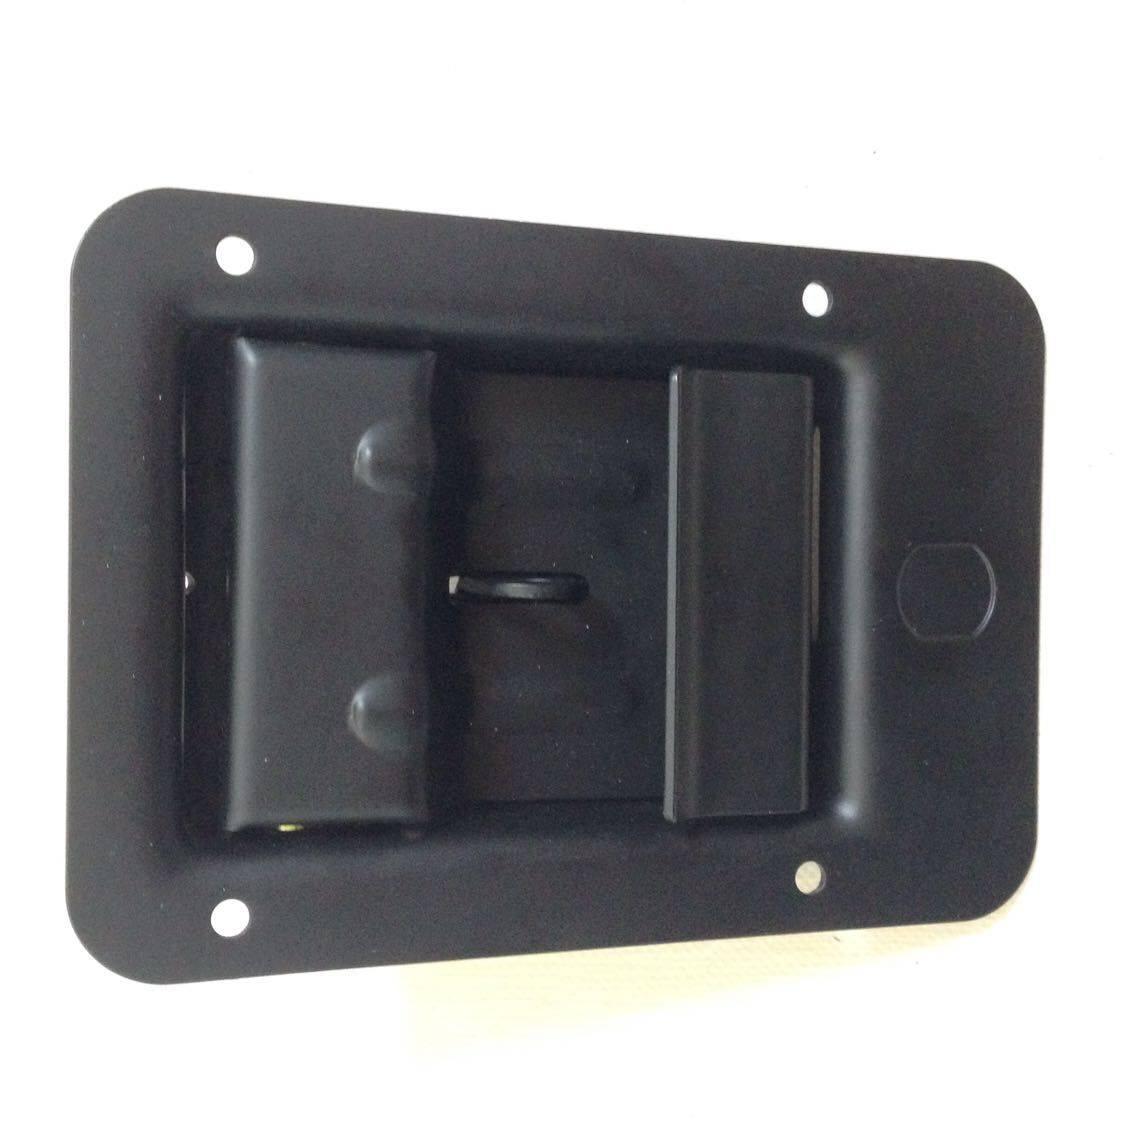 High quality generator cabinet box door panel lock